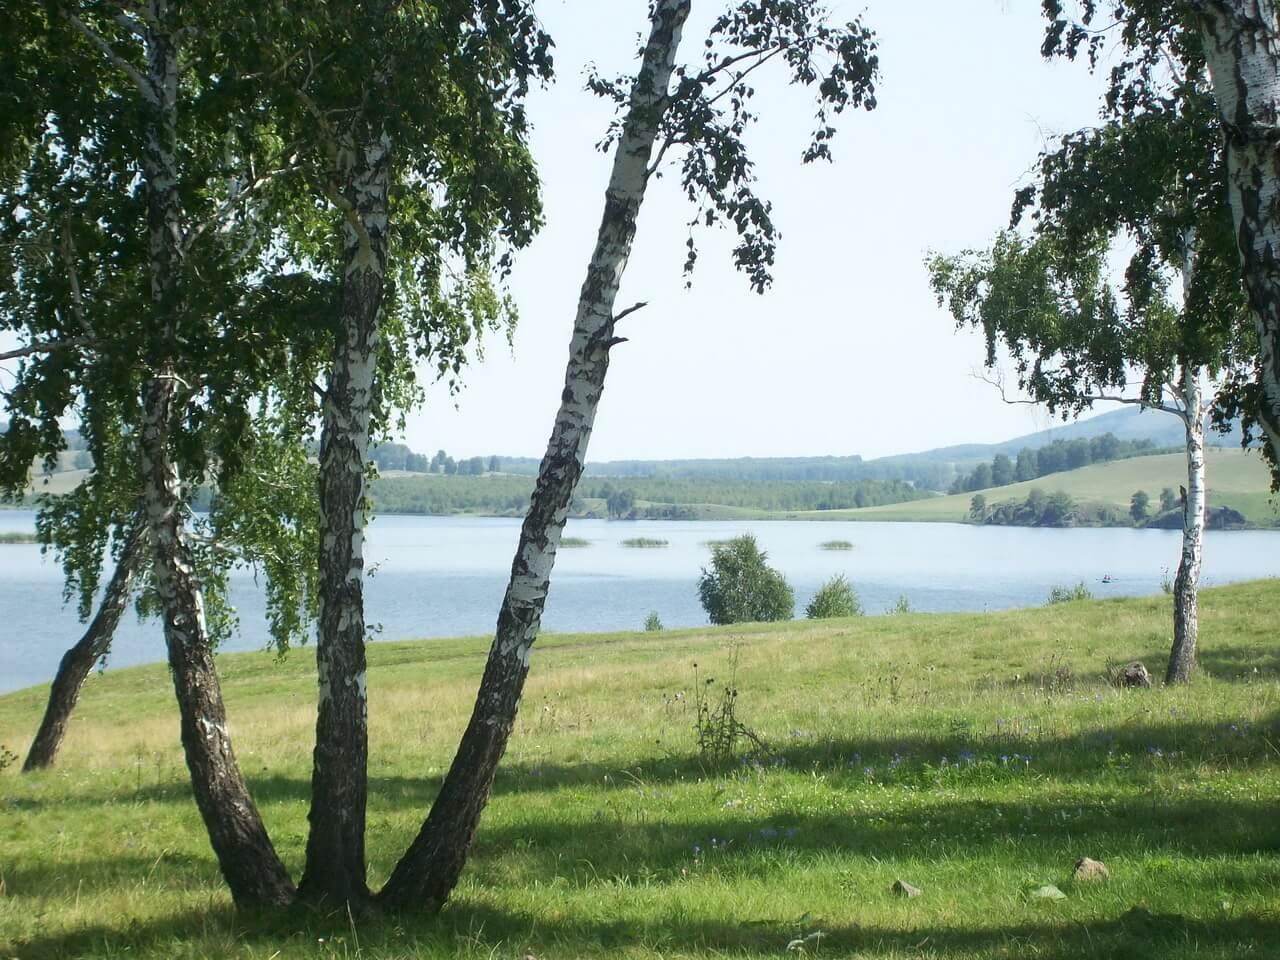 Озеро Узункуль, Озеро Узун-Куль, Башкирия, Башкортостан, Южный Урал